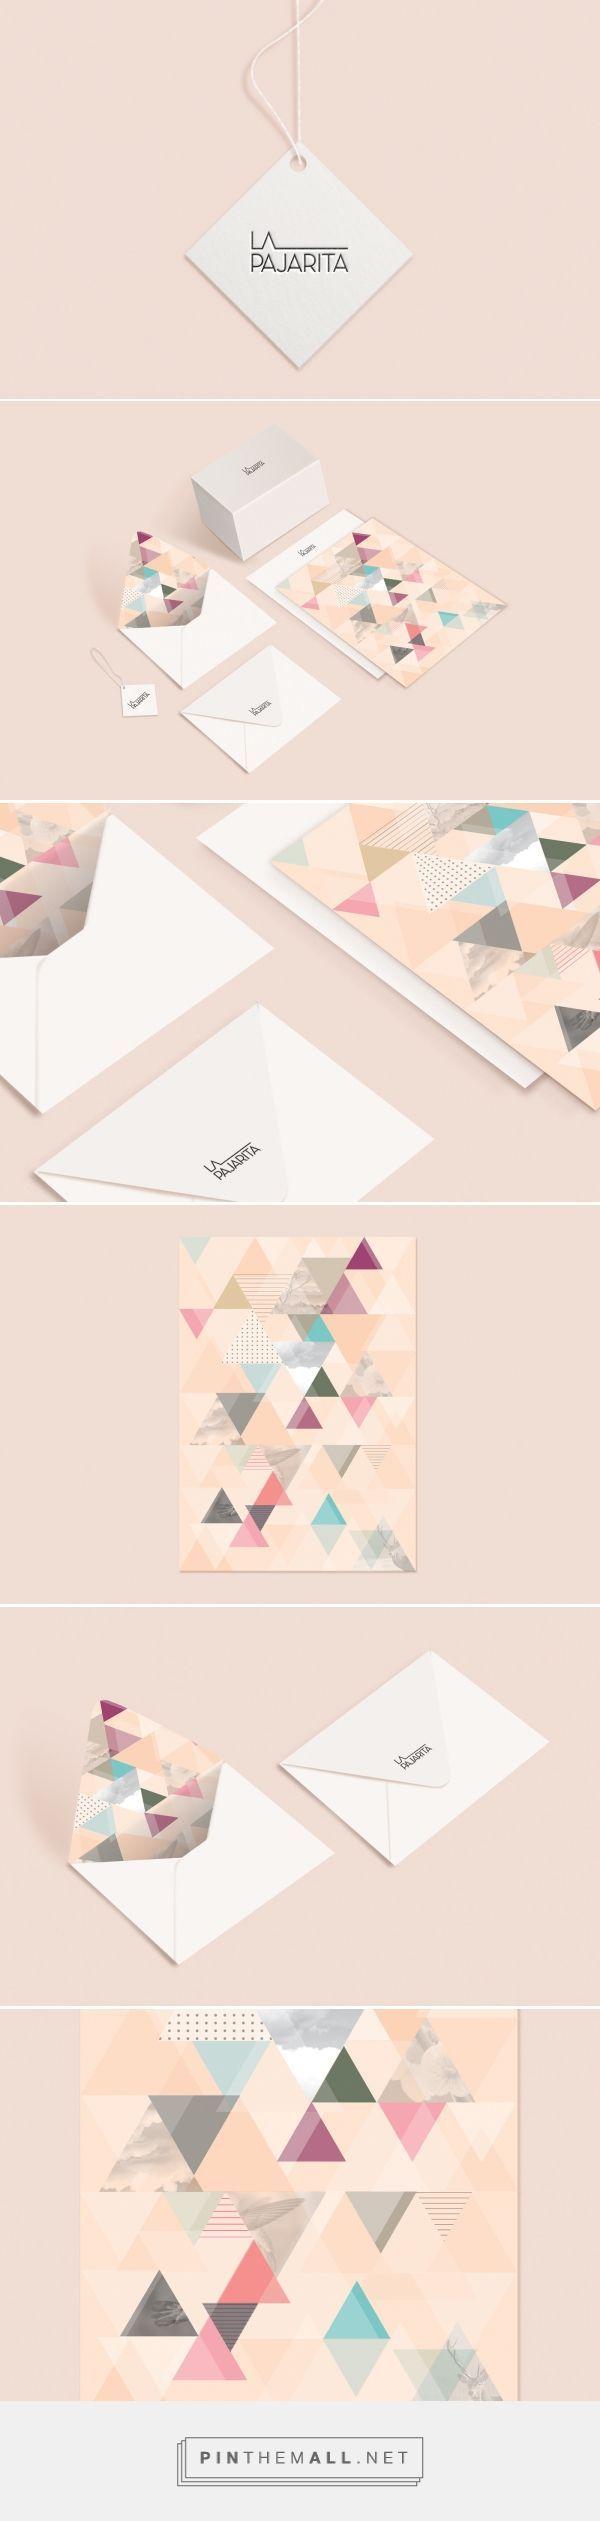 La Pajarita Branding by Maria Hdez on Behance   Fivestar Branding – Design and Branding Agency & Inspiration Gallery fivestarlogo.com/